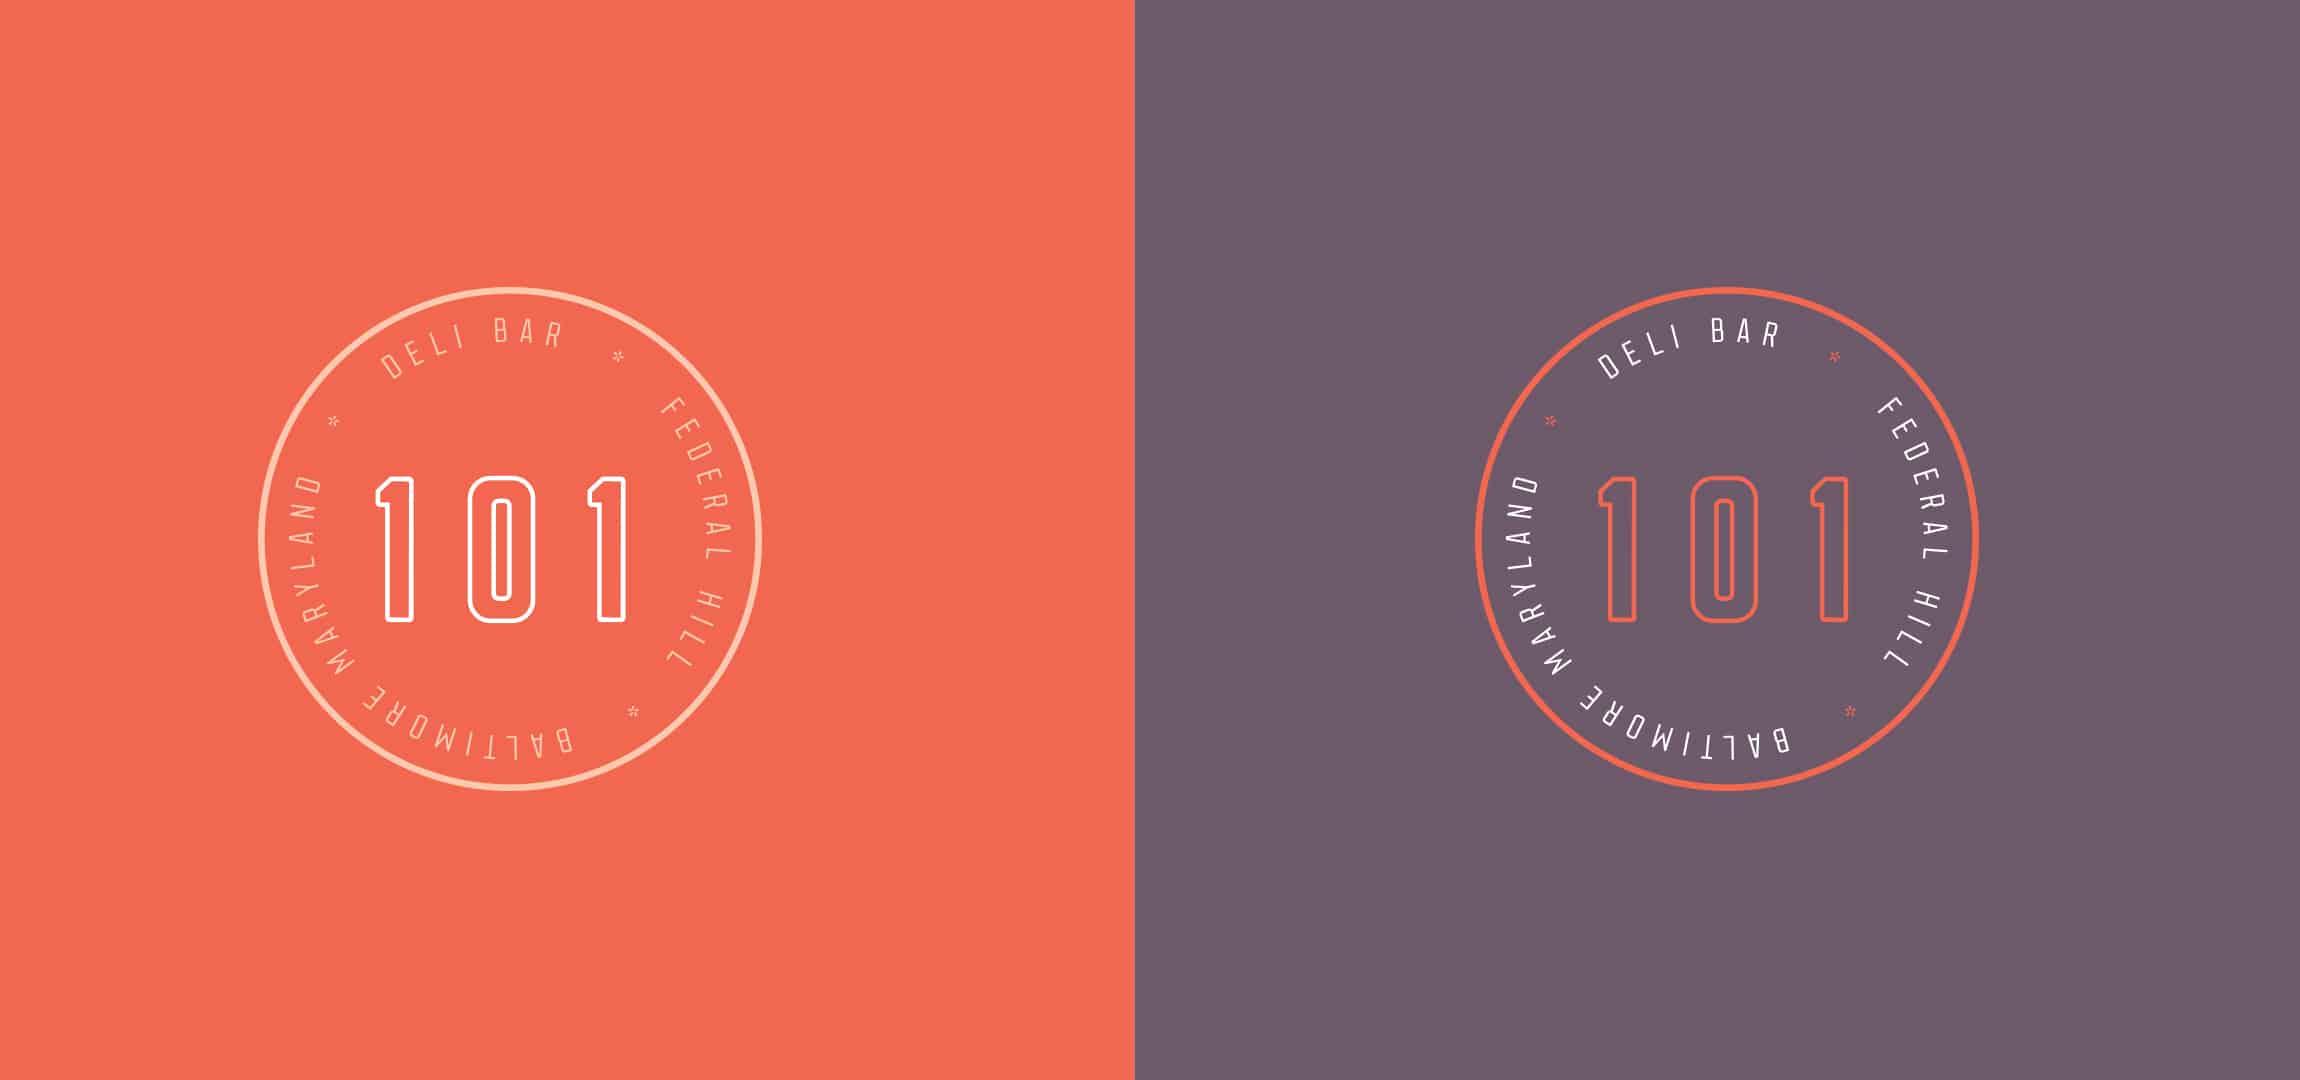 101 Delibar restaurant concept development and branding logo variations